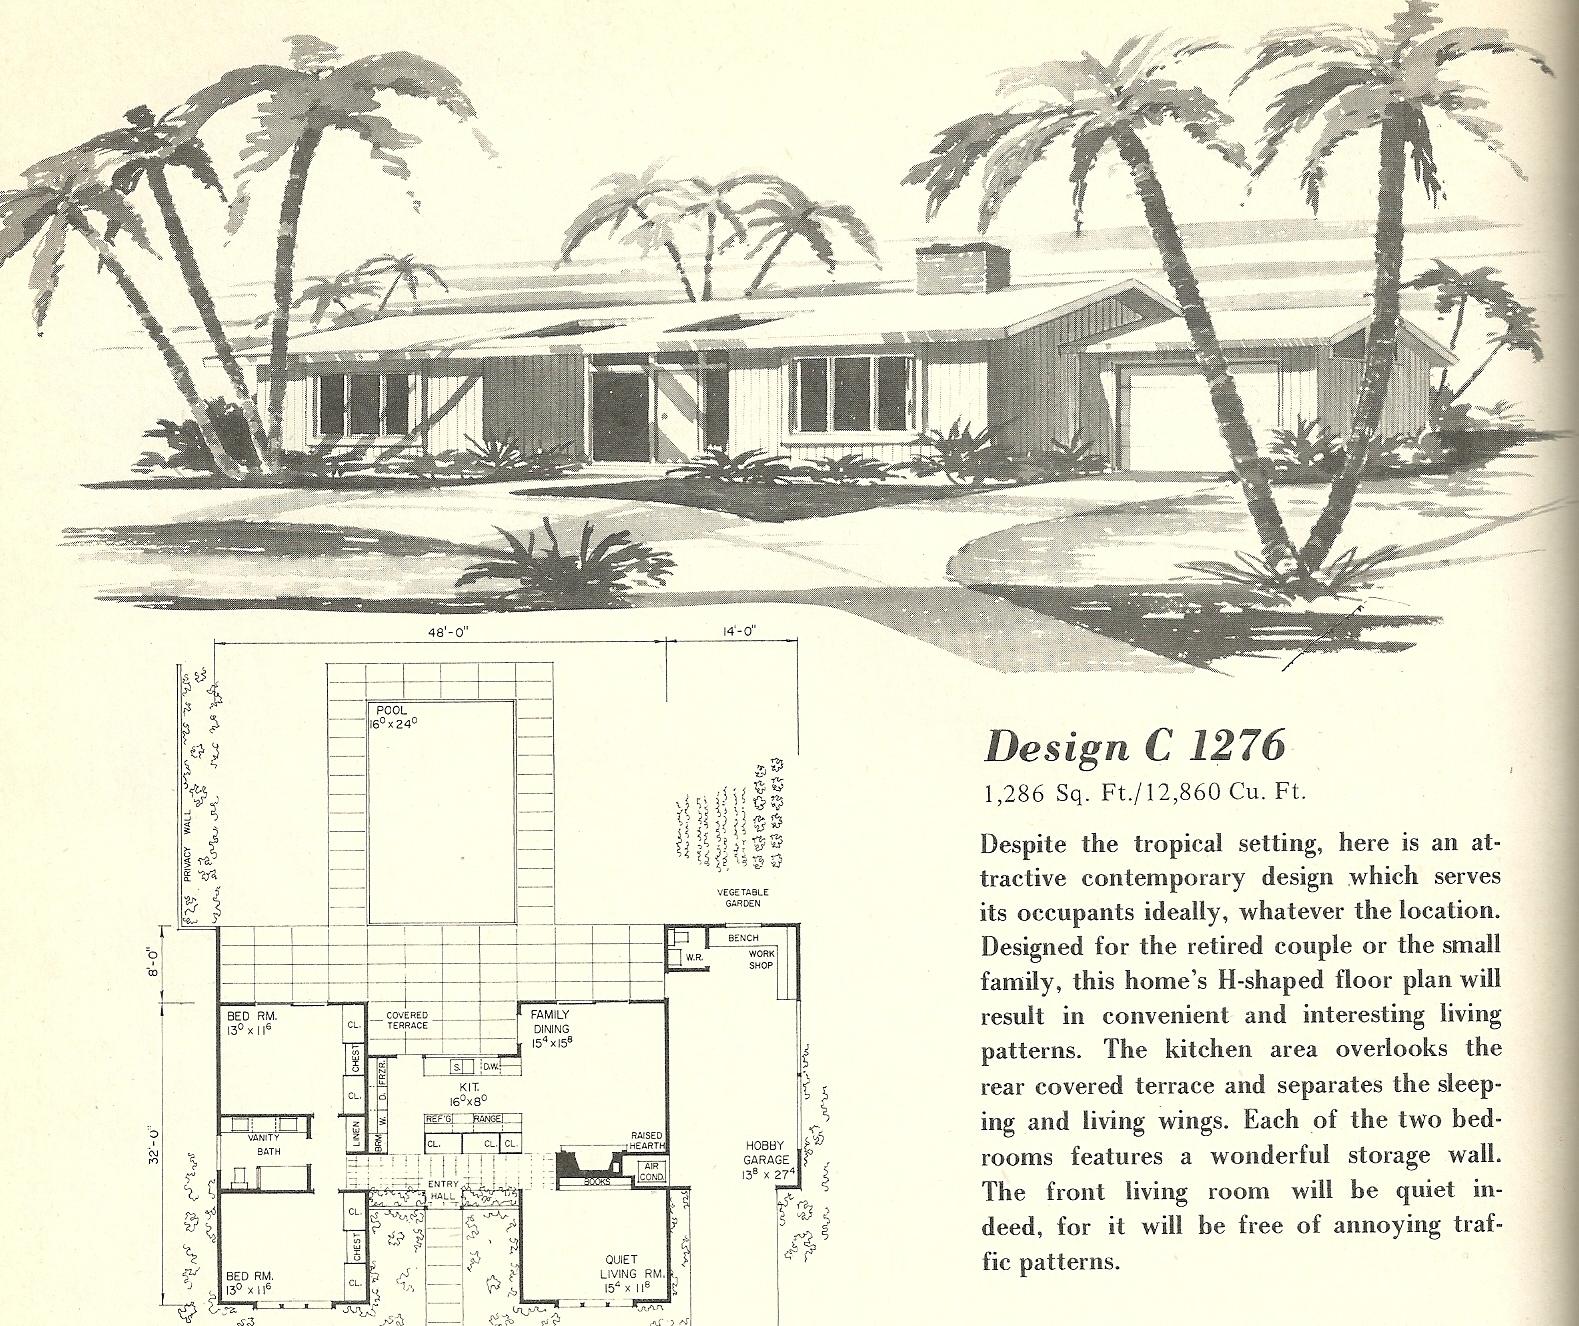 Vintage house plans 1276 antique alter ego for 1960 house plans